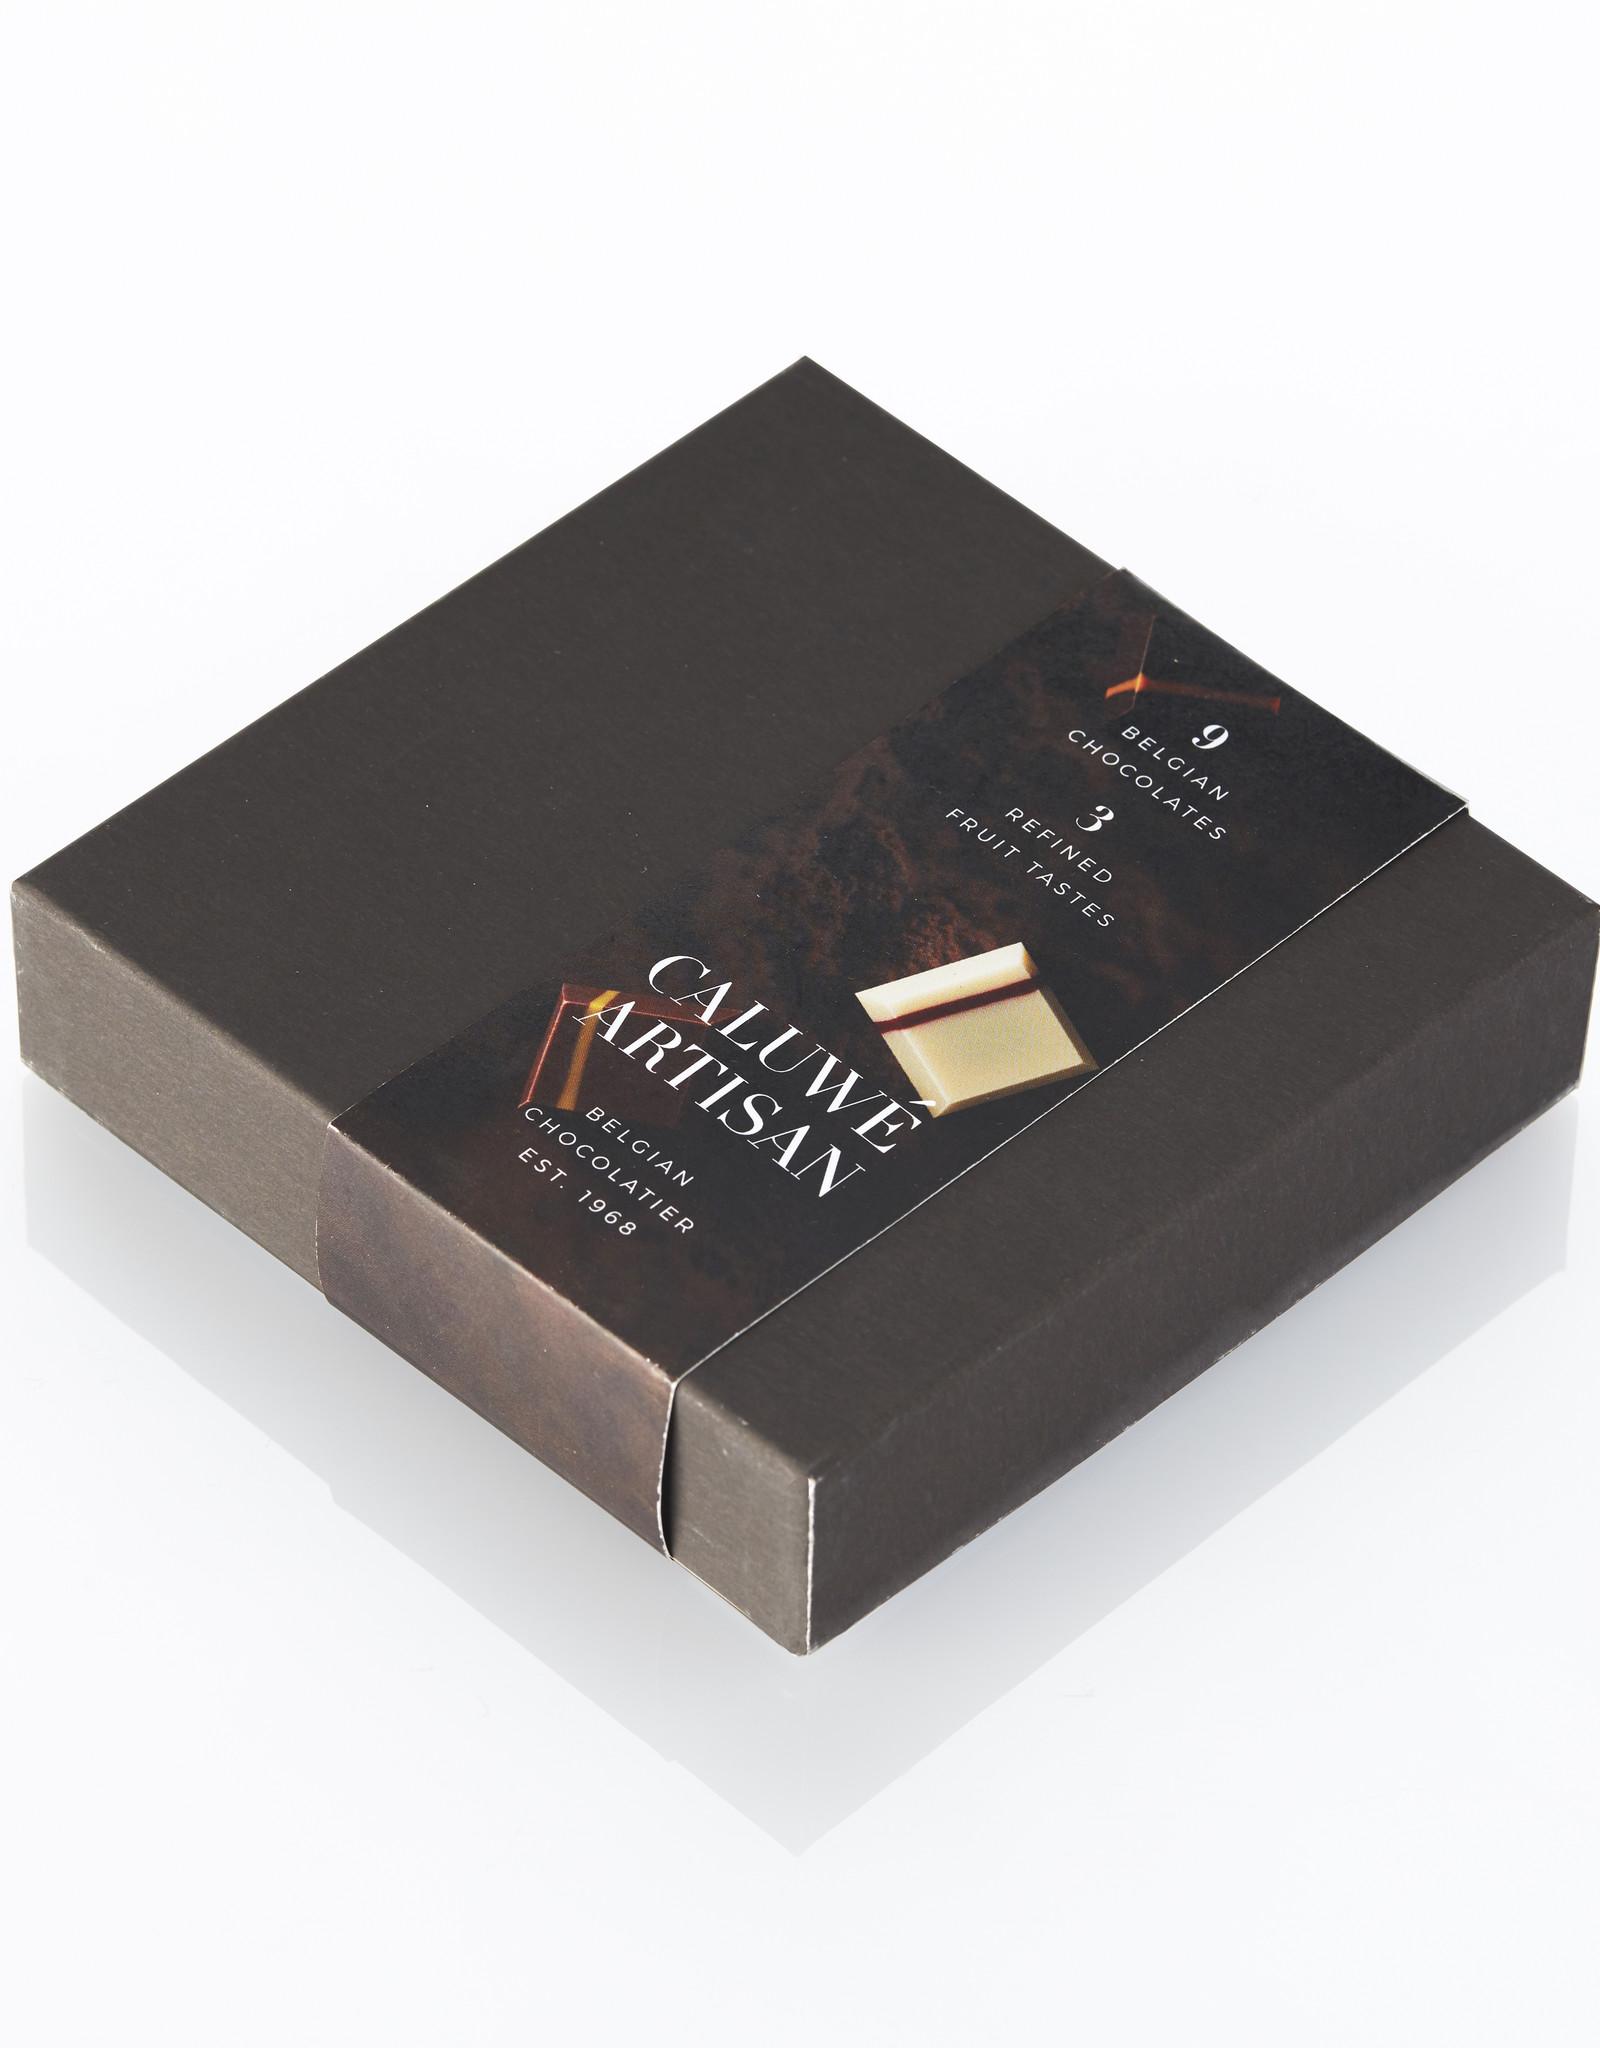 Caluwe Artisan Rigid box 105g - fruit assortiment - UTZ